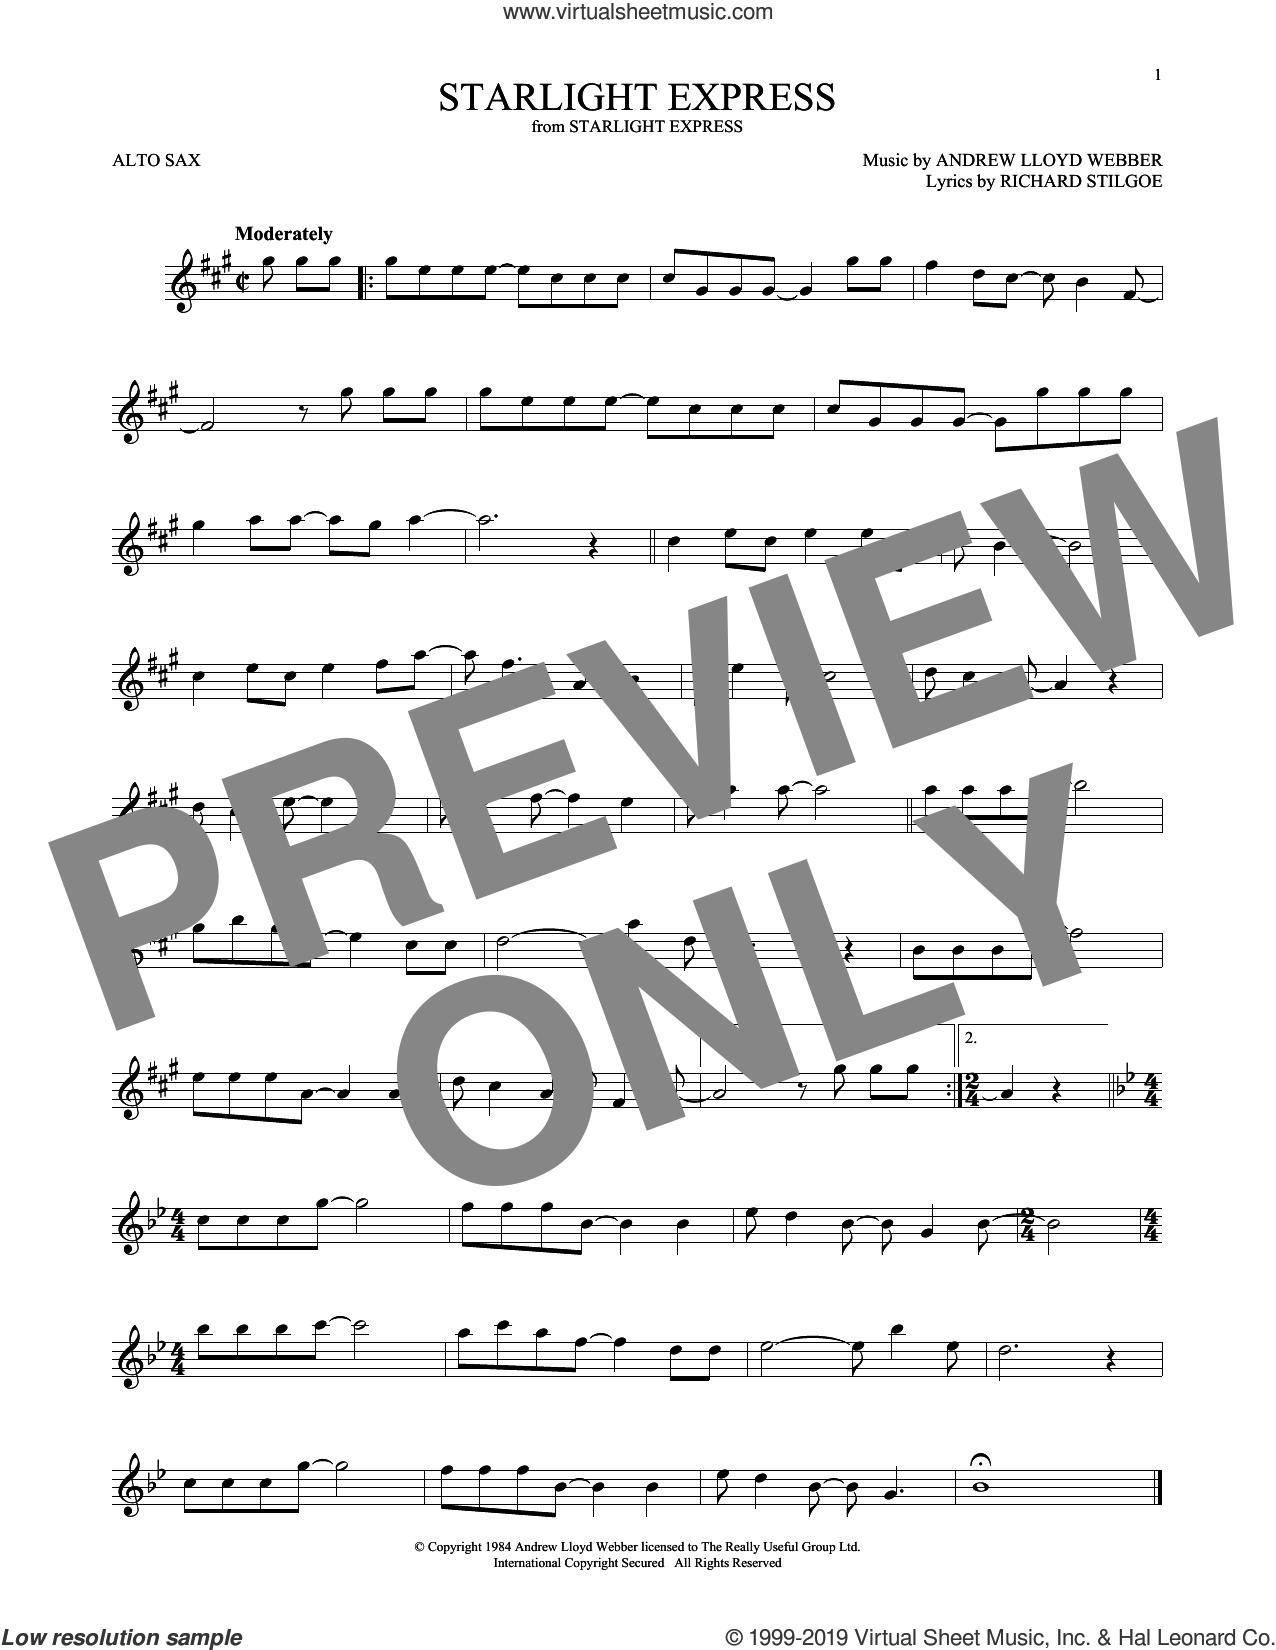 Starlight Express sheet music for alto saxophone solo by Andrew Lloyd Webber and Richard Stilgoe, intermediate skill level